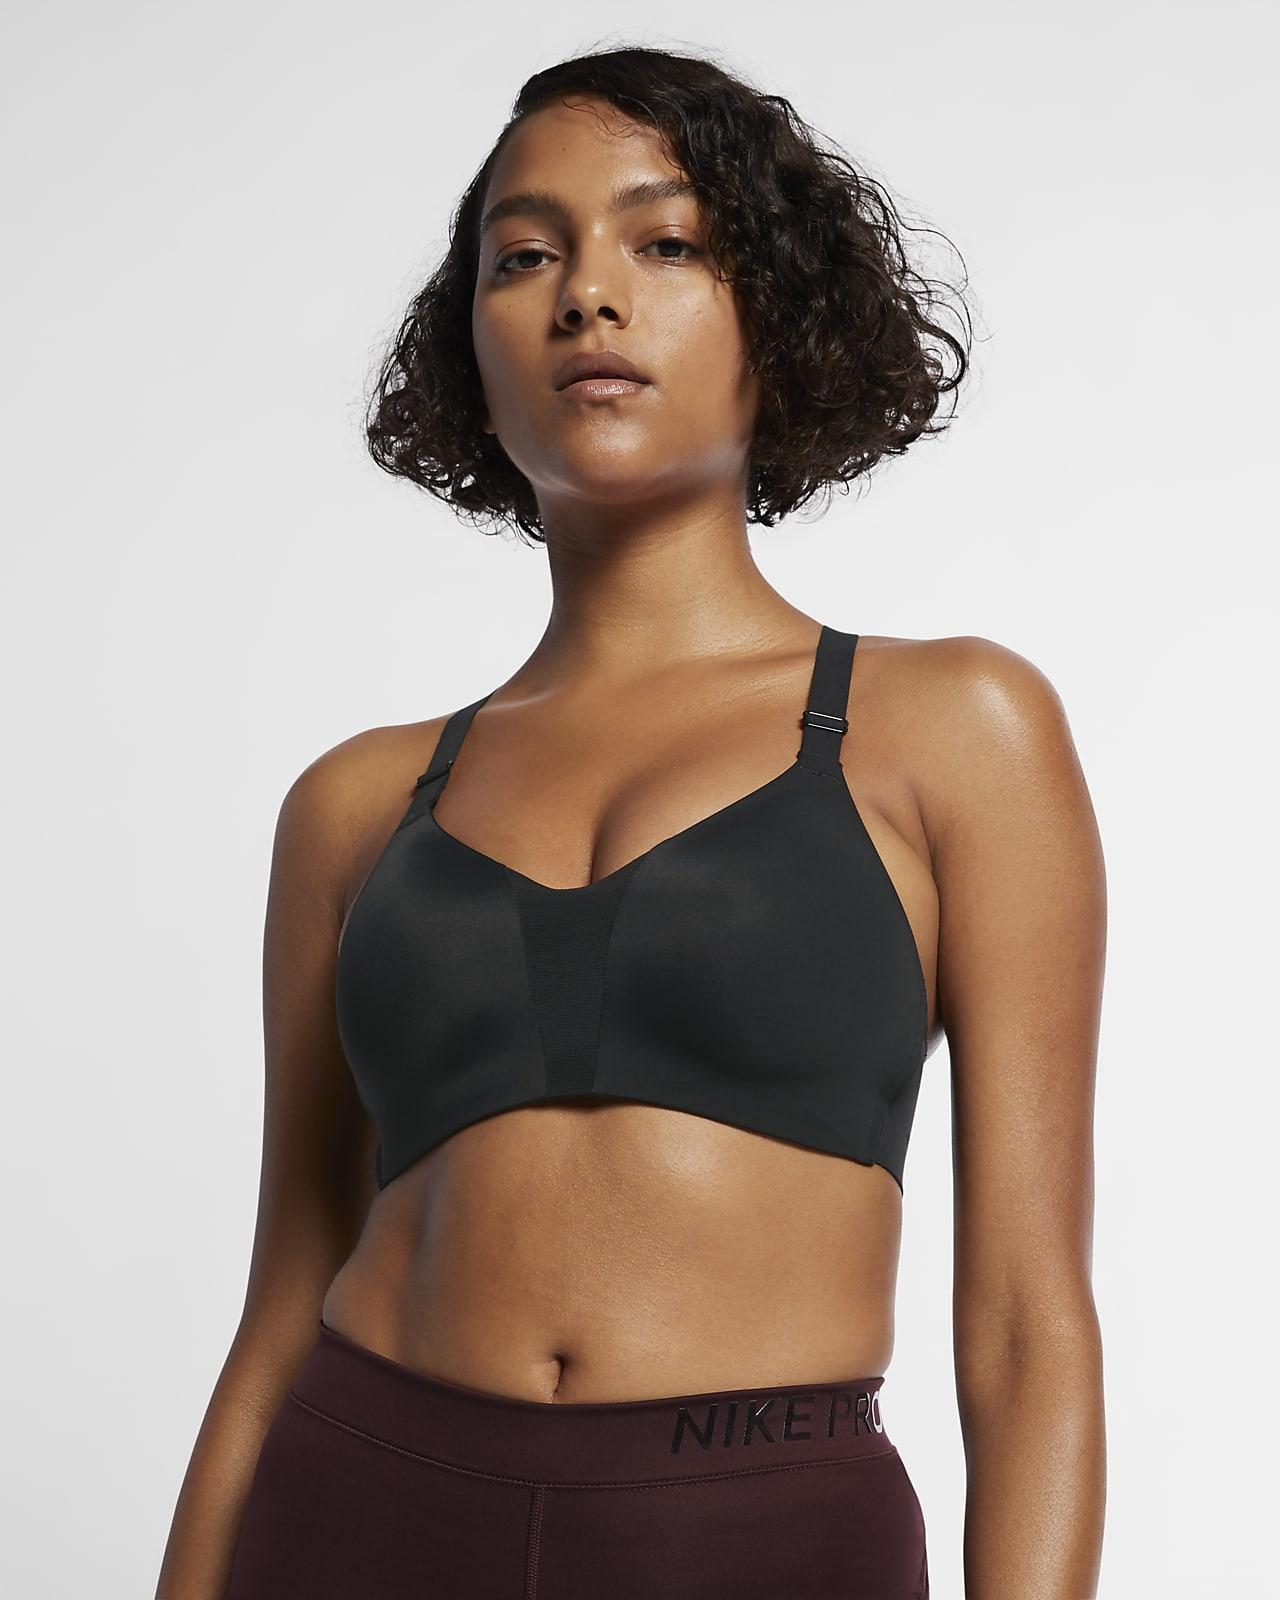 Mujer NIKE Rival Plus Size Bra Top